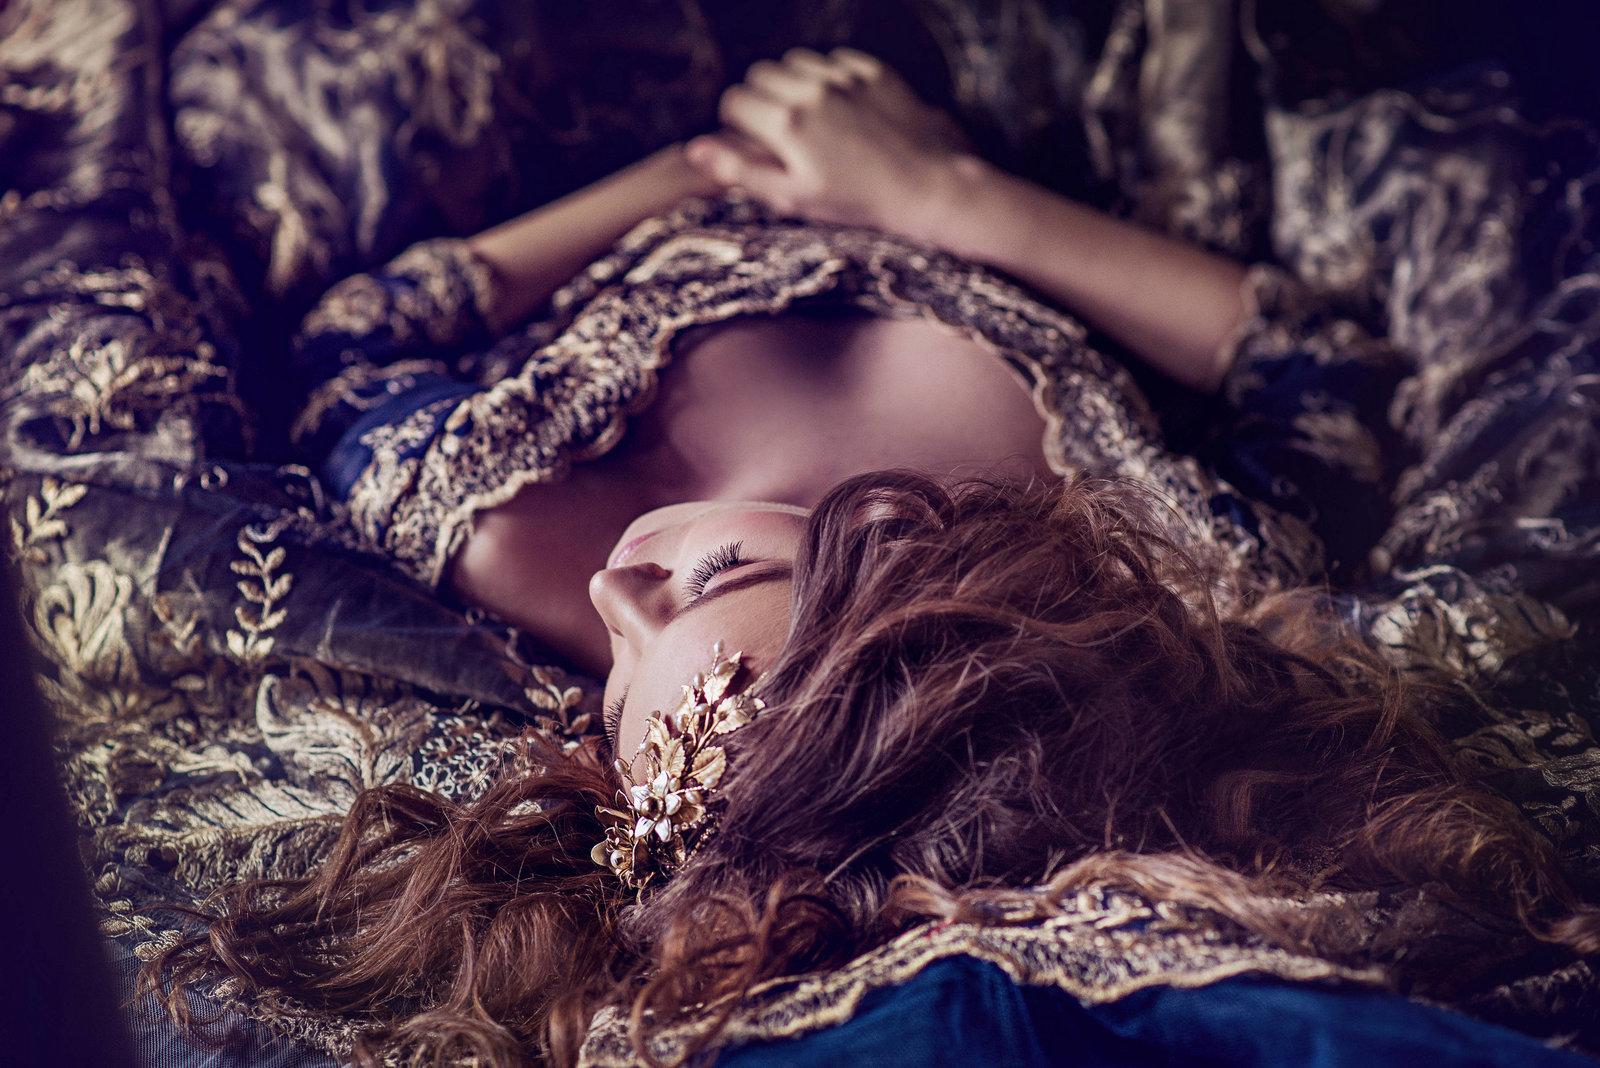 navy_gold_lace_ballgown_JoanneFlemingDesign_LucianaVargaPhoto (3)